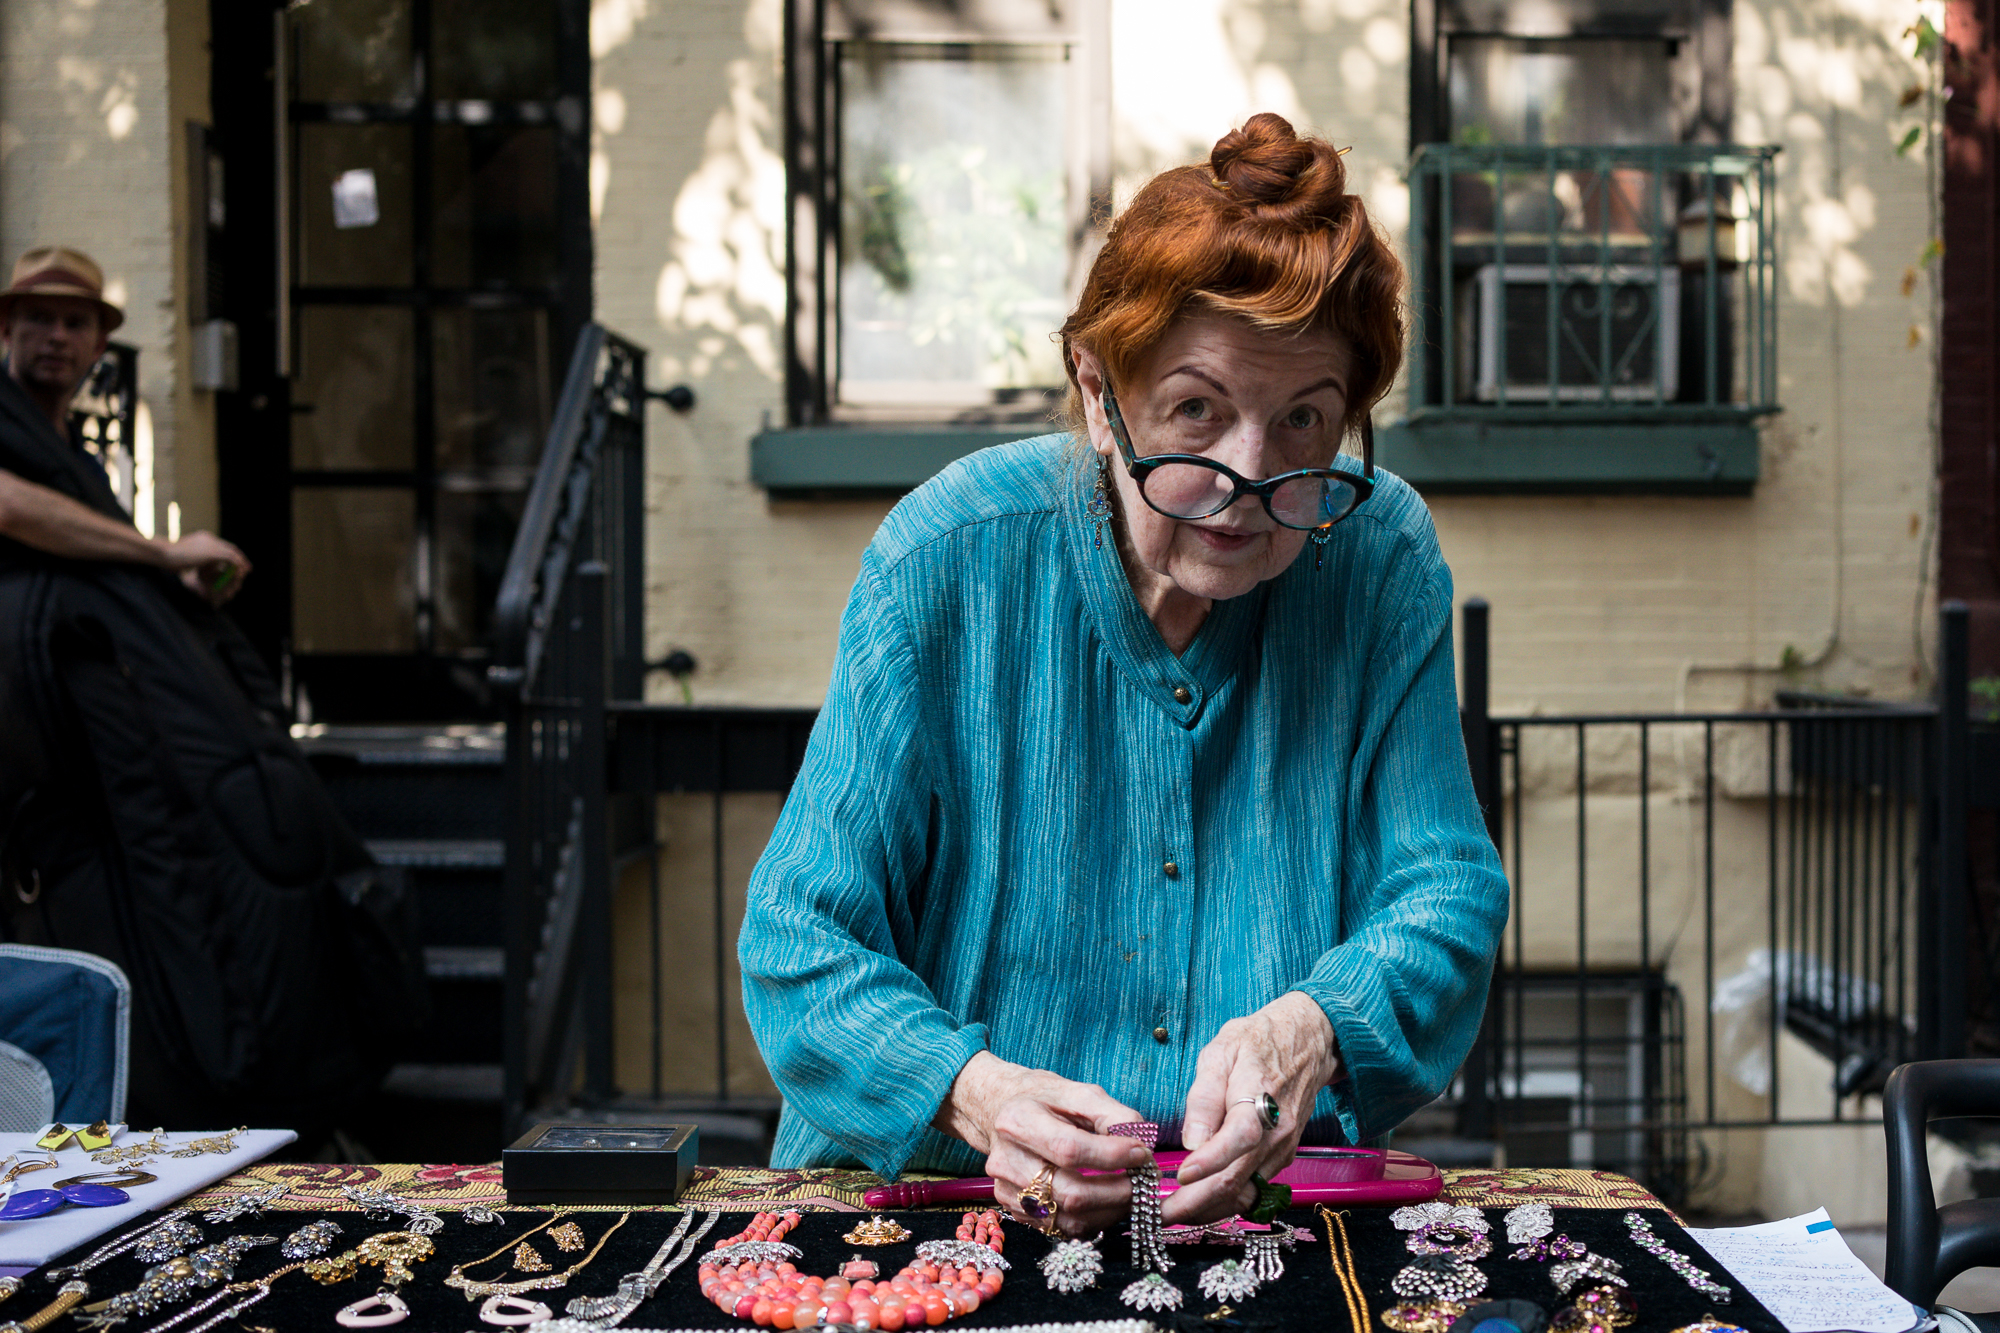 Street Vendor / East Village